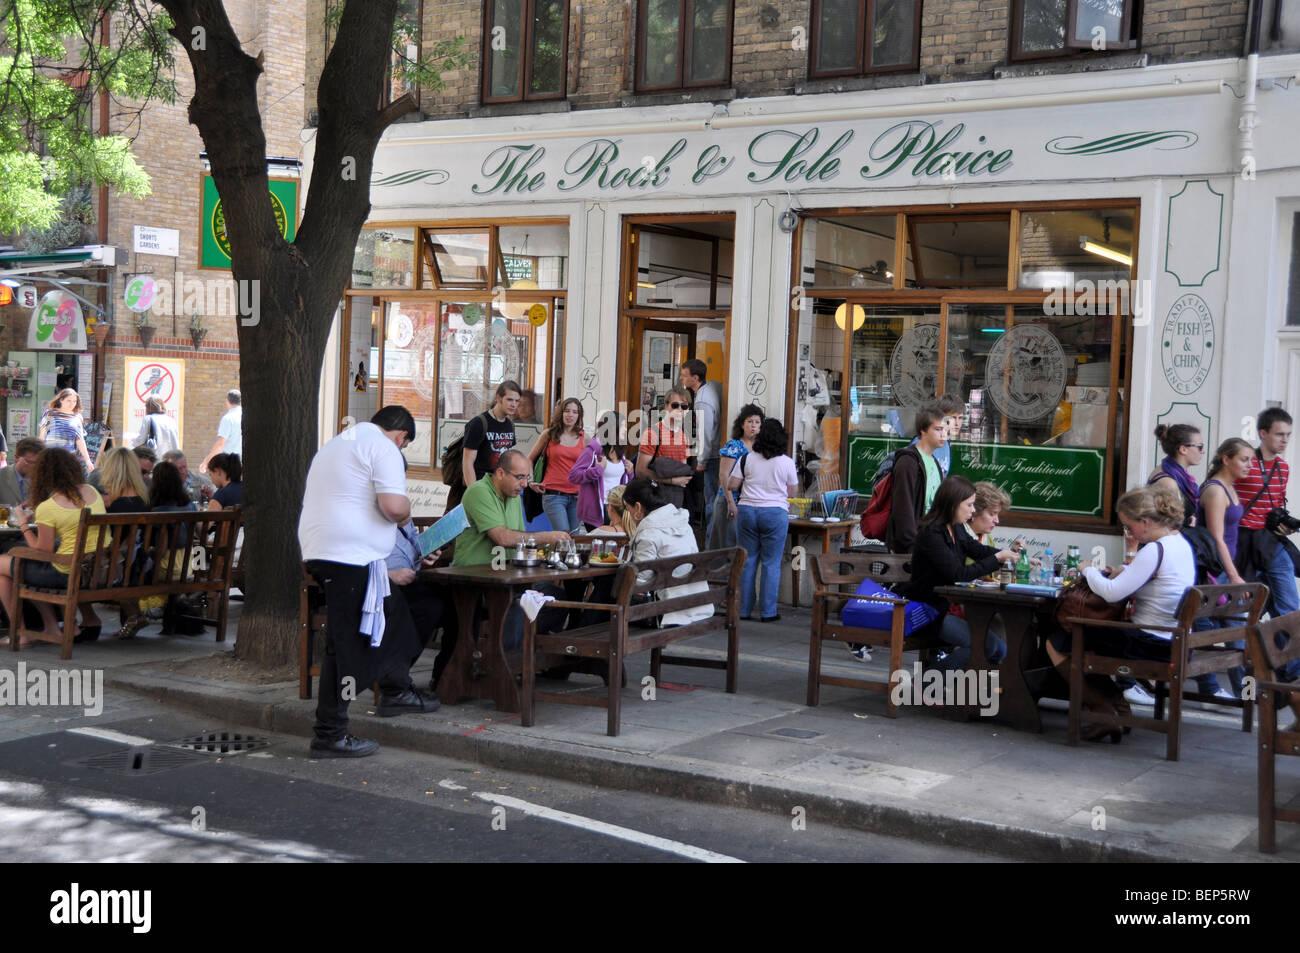 Beliebtes Fish and Chips Restaurant in Londons Covent Garden London England Stockbild